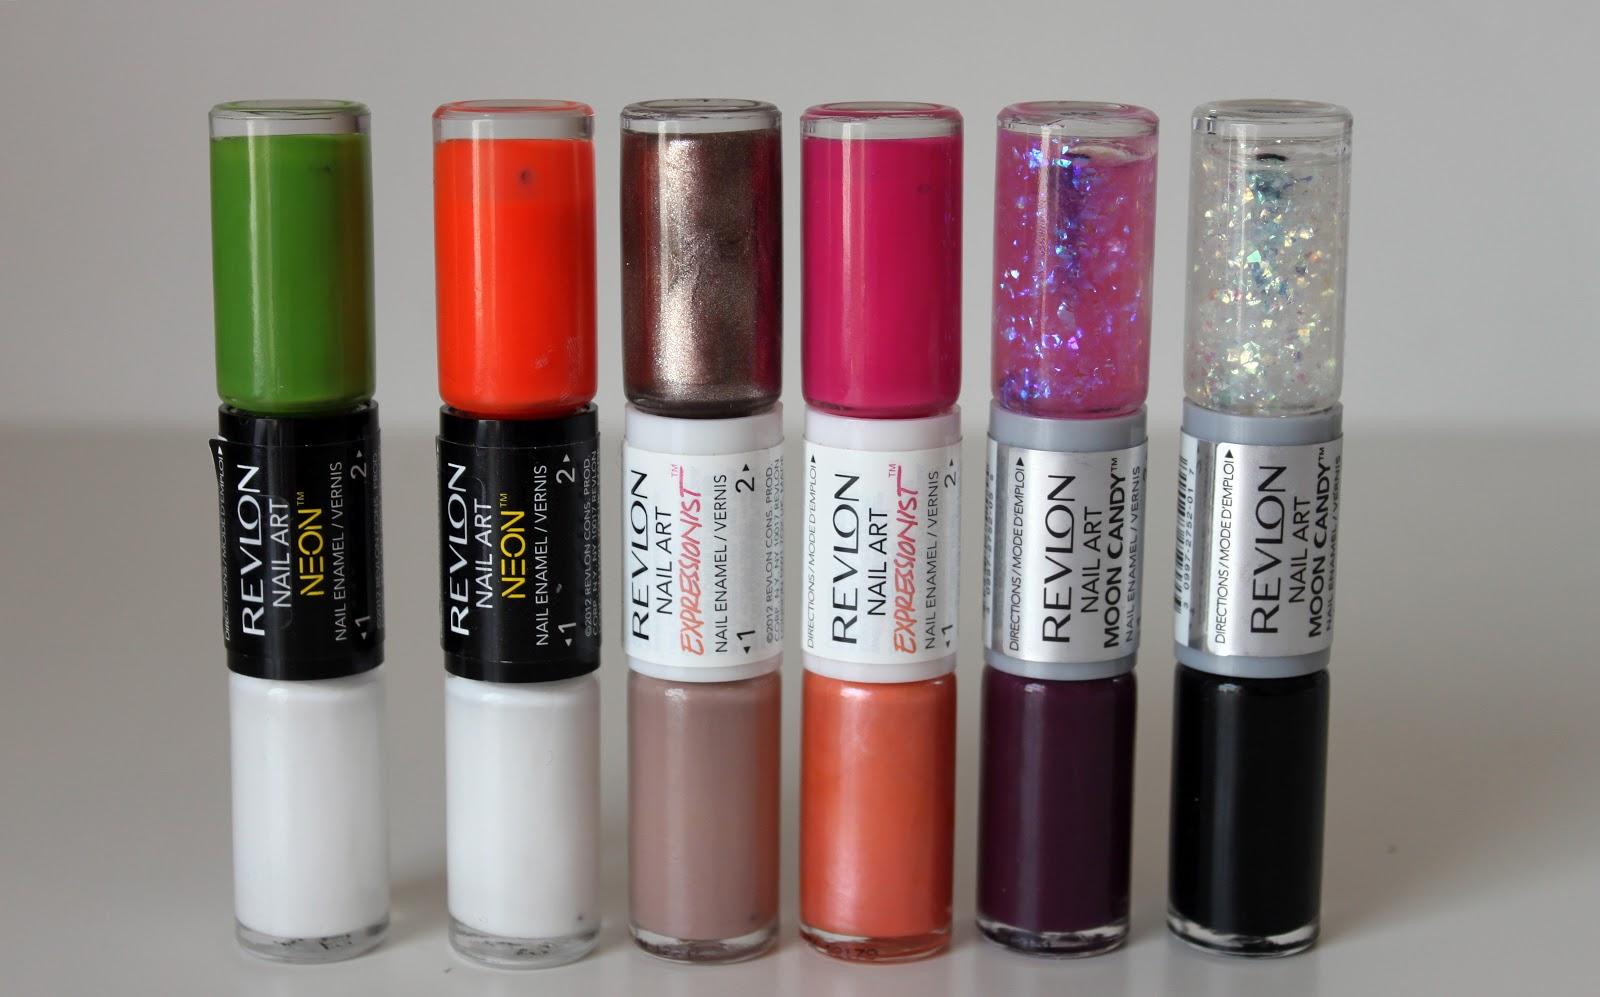 Revlon Nail Art Pens+ Nail art Idea - A Little Obsessed